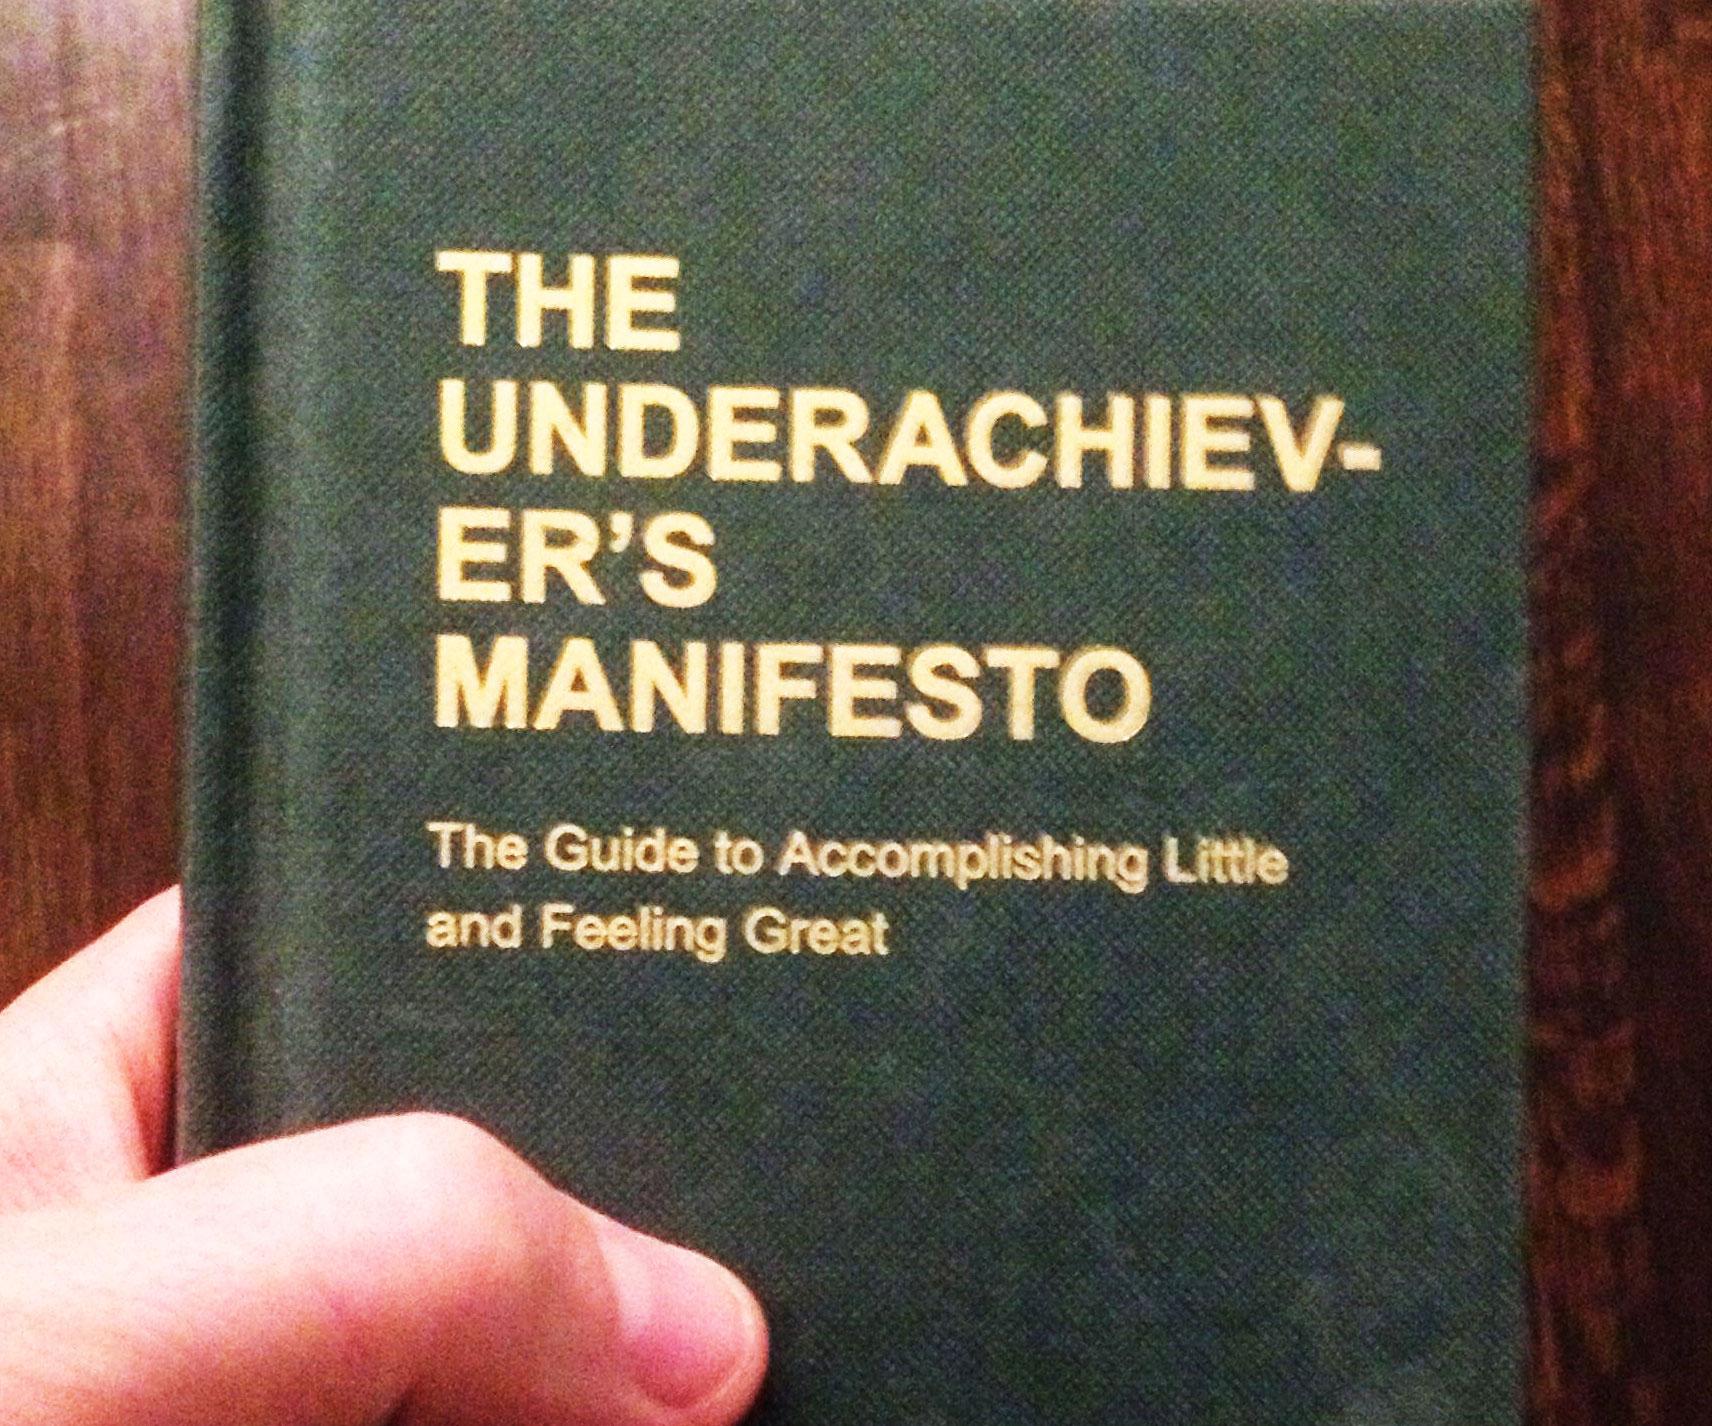 The Underachiever's Manifesto